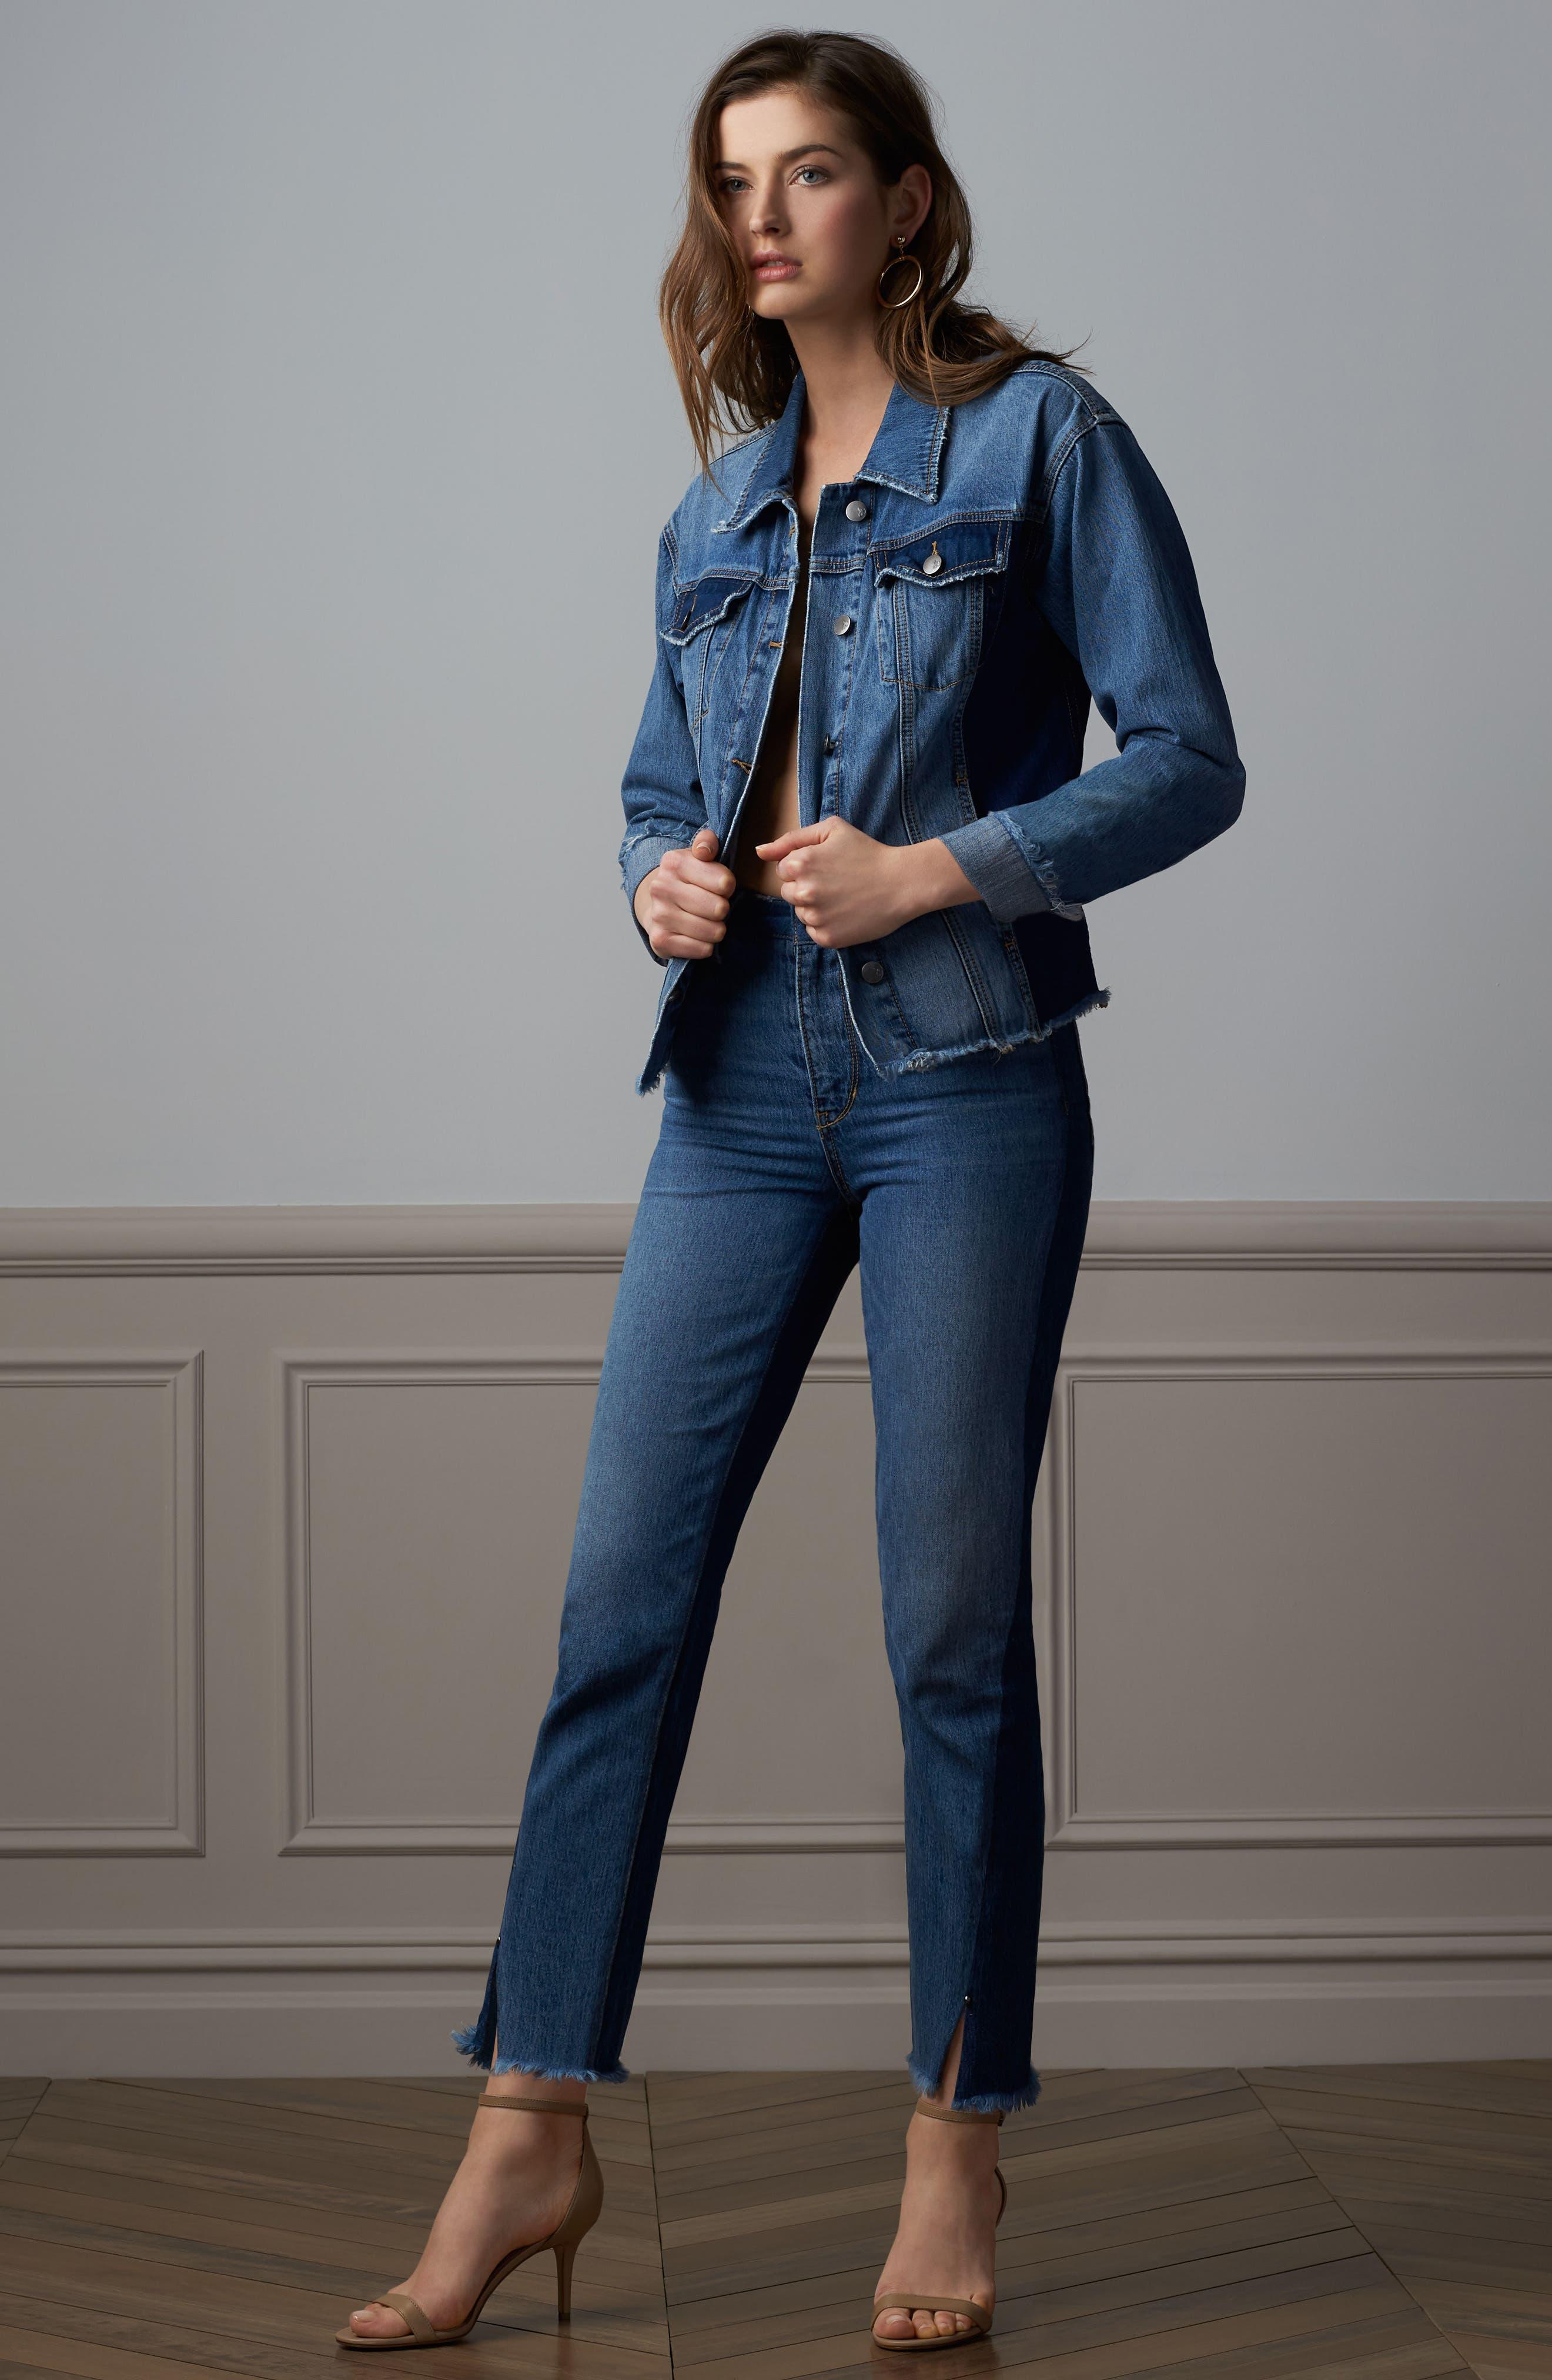 The Mary Jane Fringe Hem Contrast Jeans,                             Alternate thumbnail 7, color,                             410